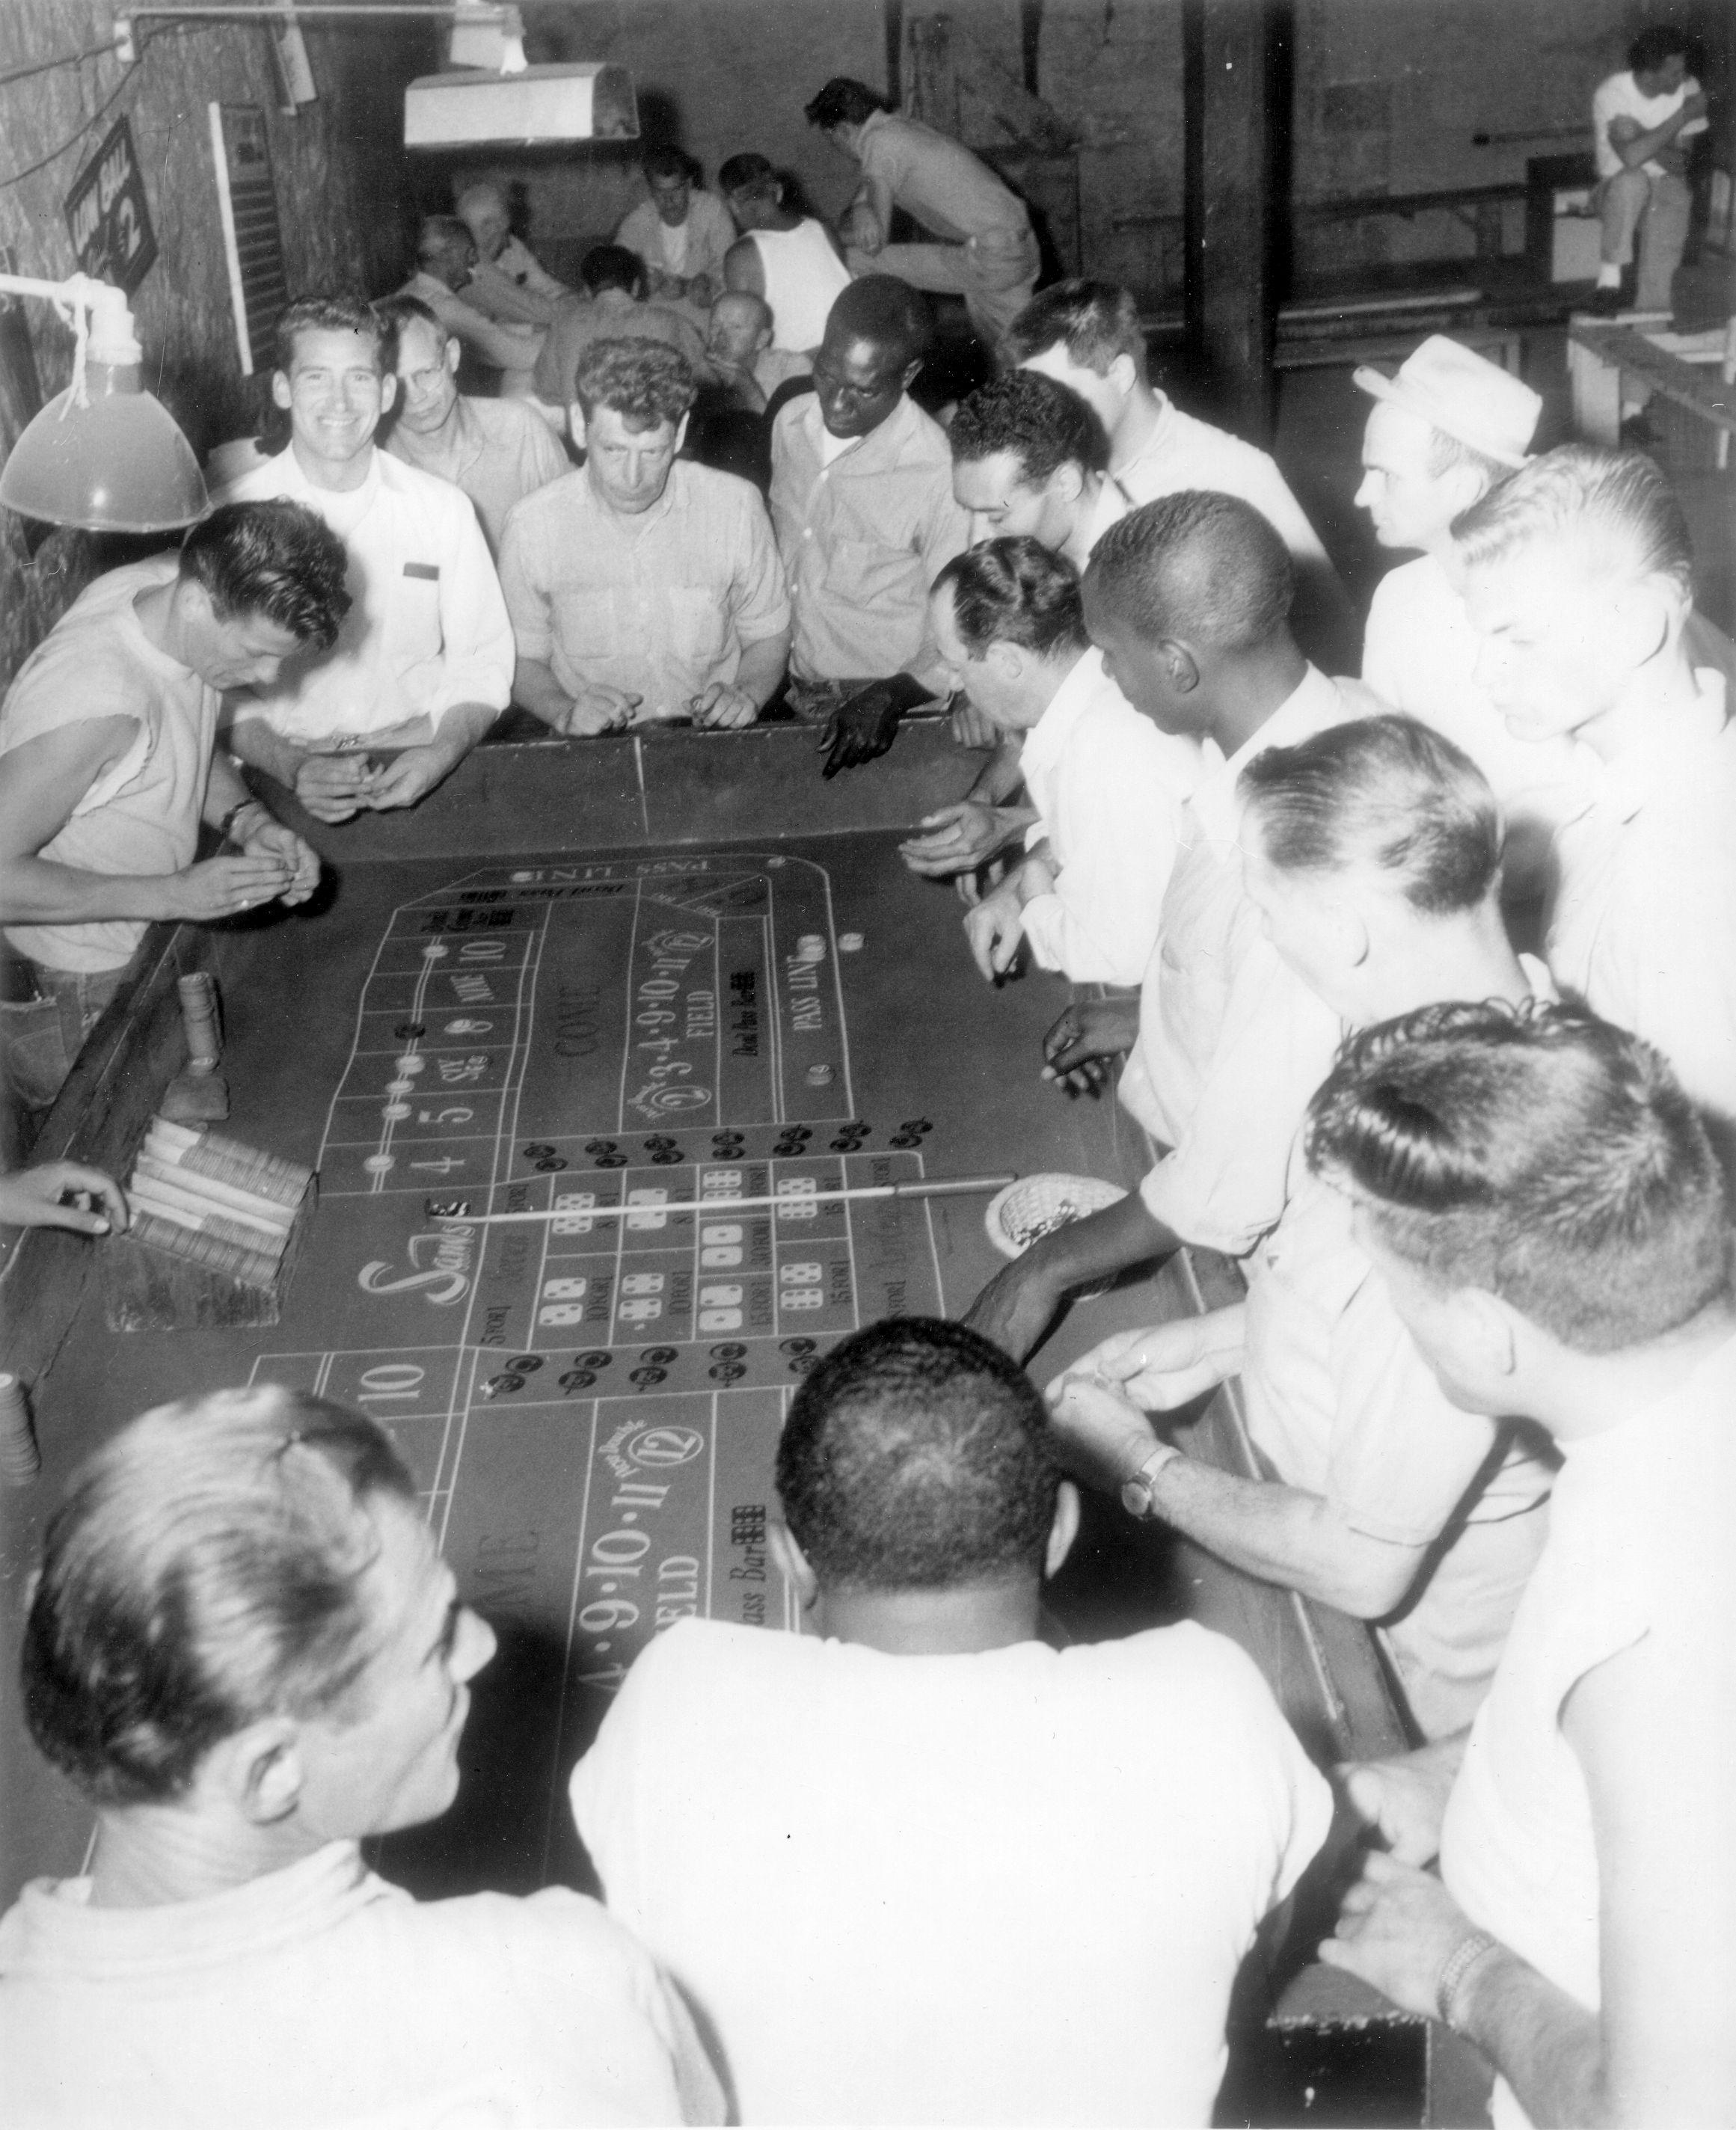 Prisoners gambling inside the Nevada state prison